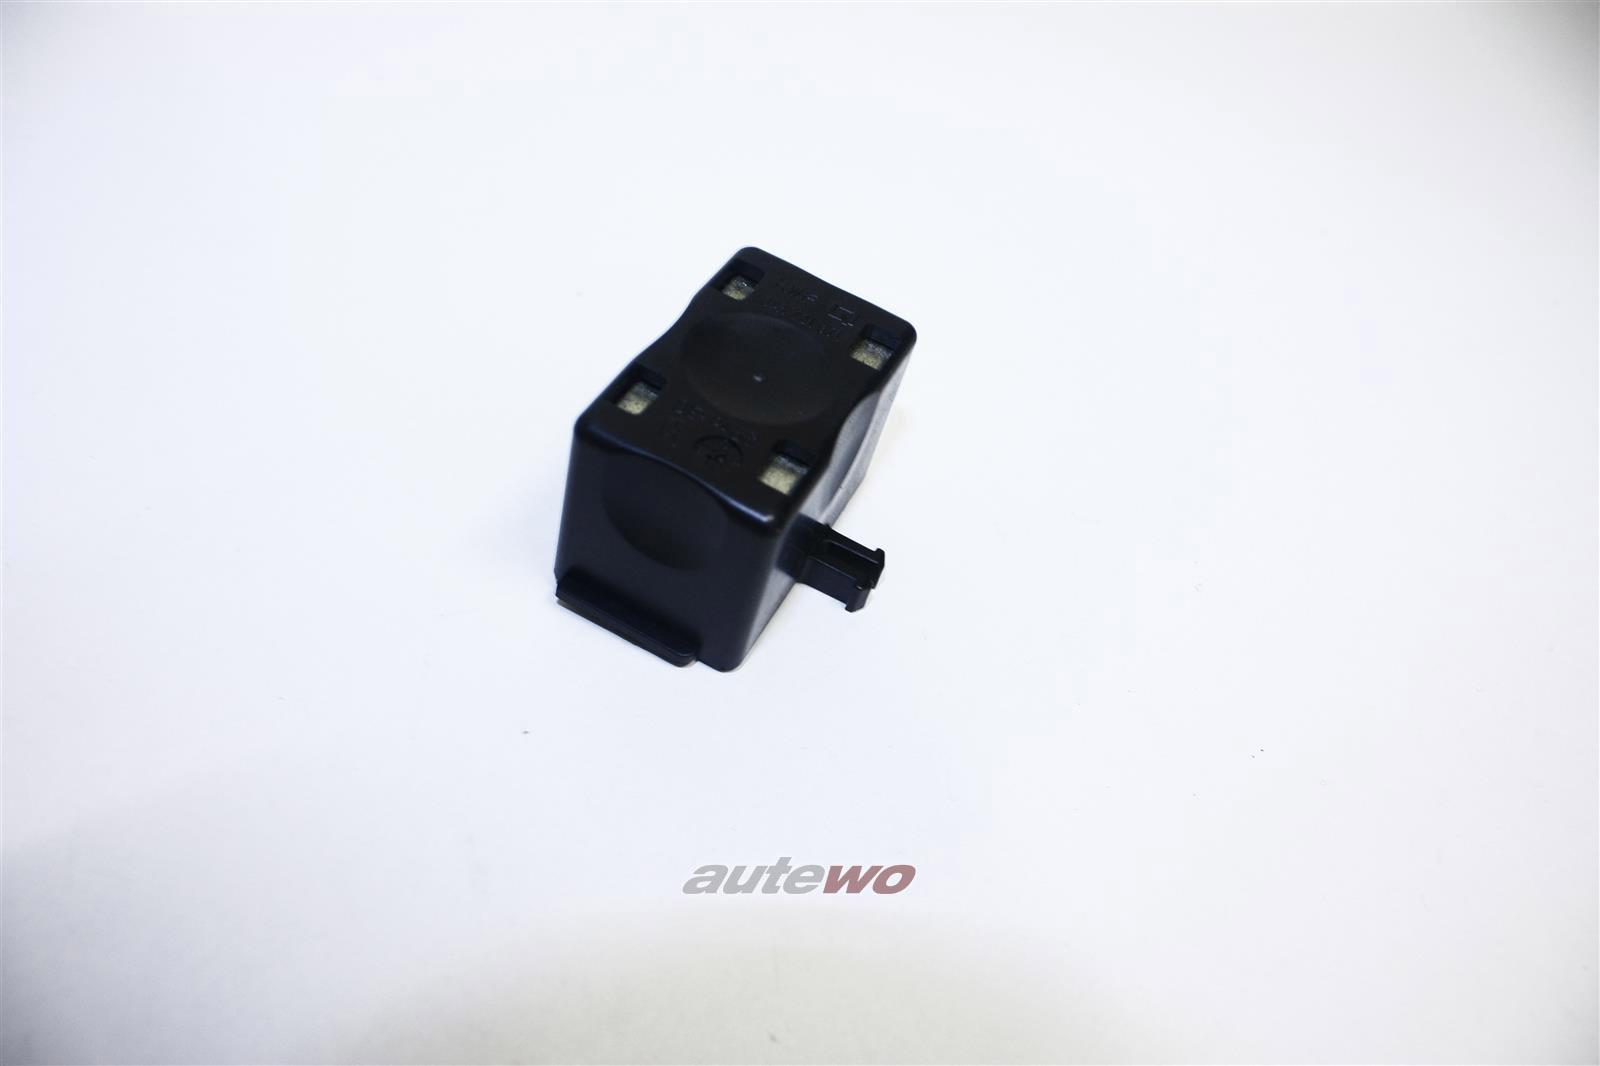 NEU! Audi/VW A3/Golf/Polo/Beetle Tilgergewicht Pedal 3A1721871